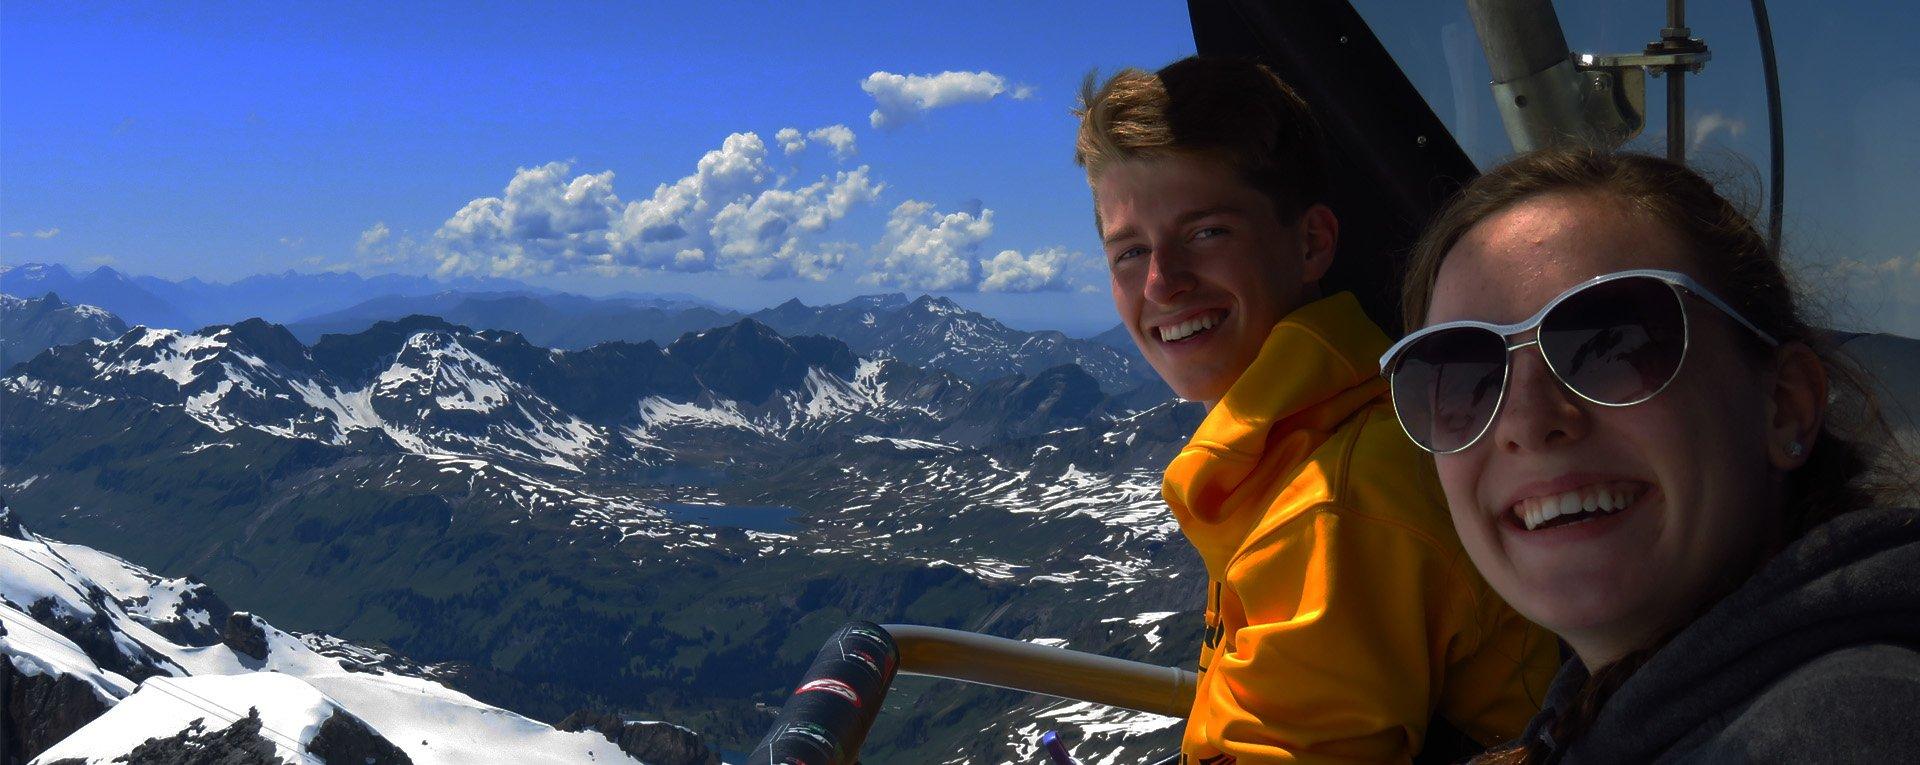 Jumpstreet-Tours-France-Class-Trips-Paris-Alps-Lander-Head